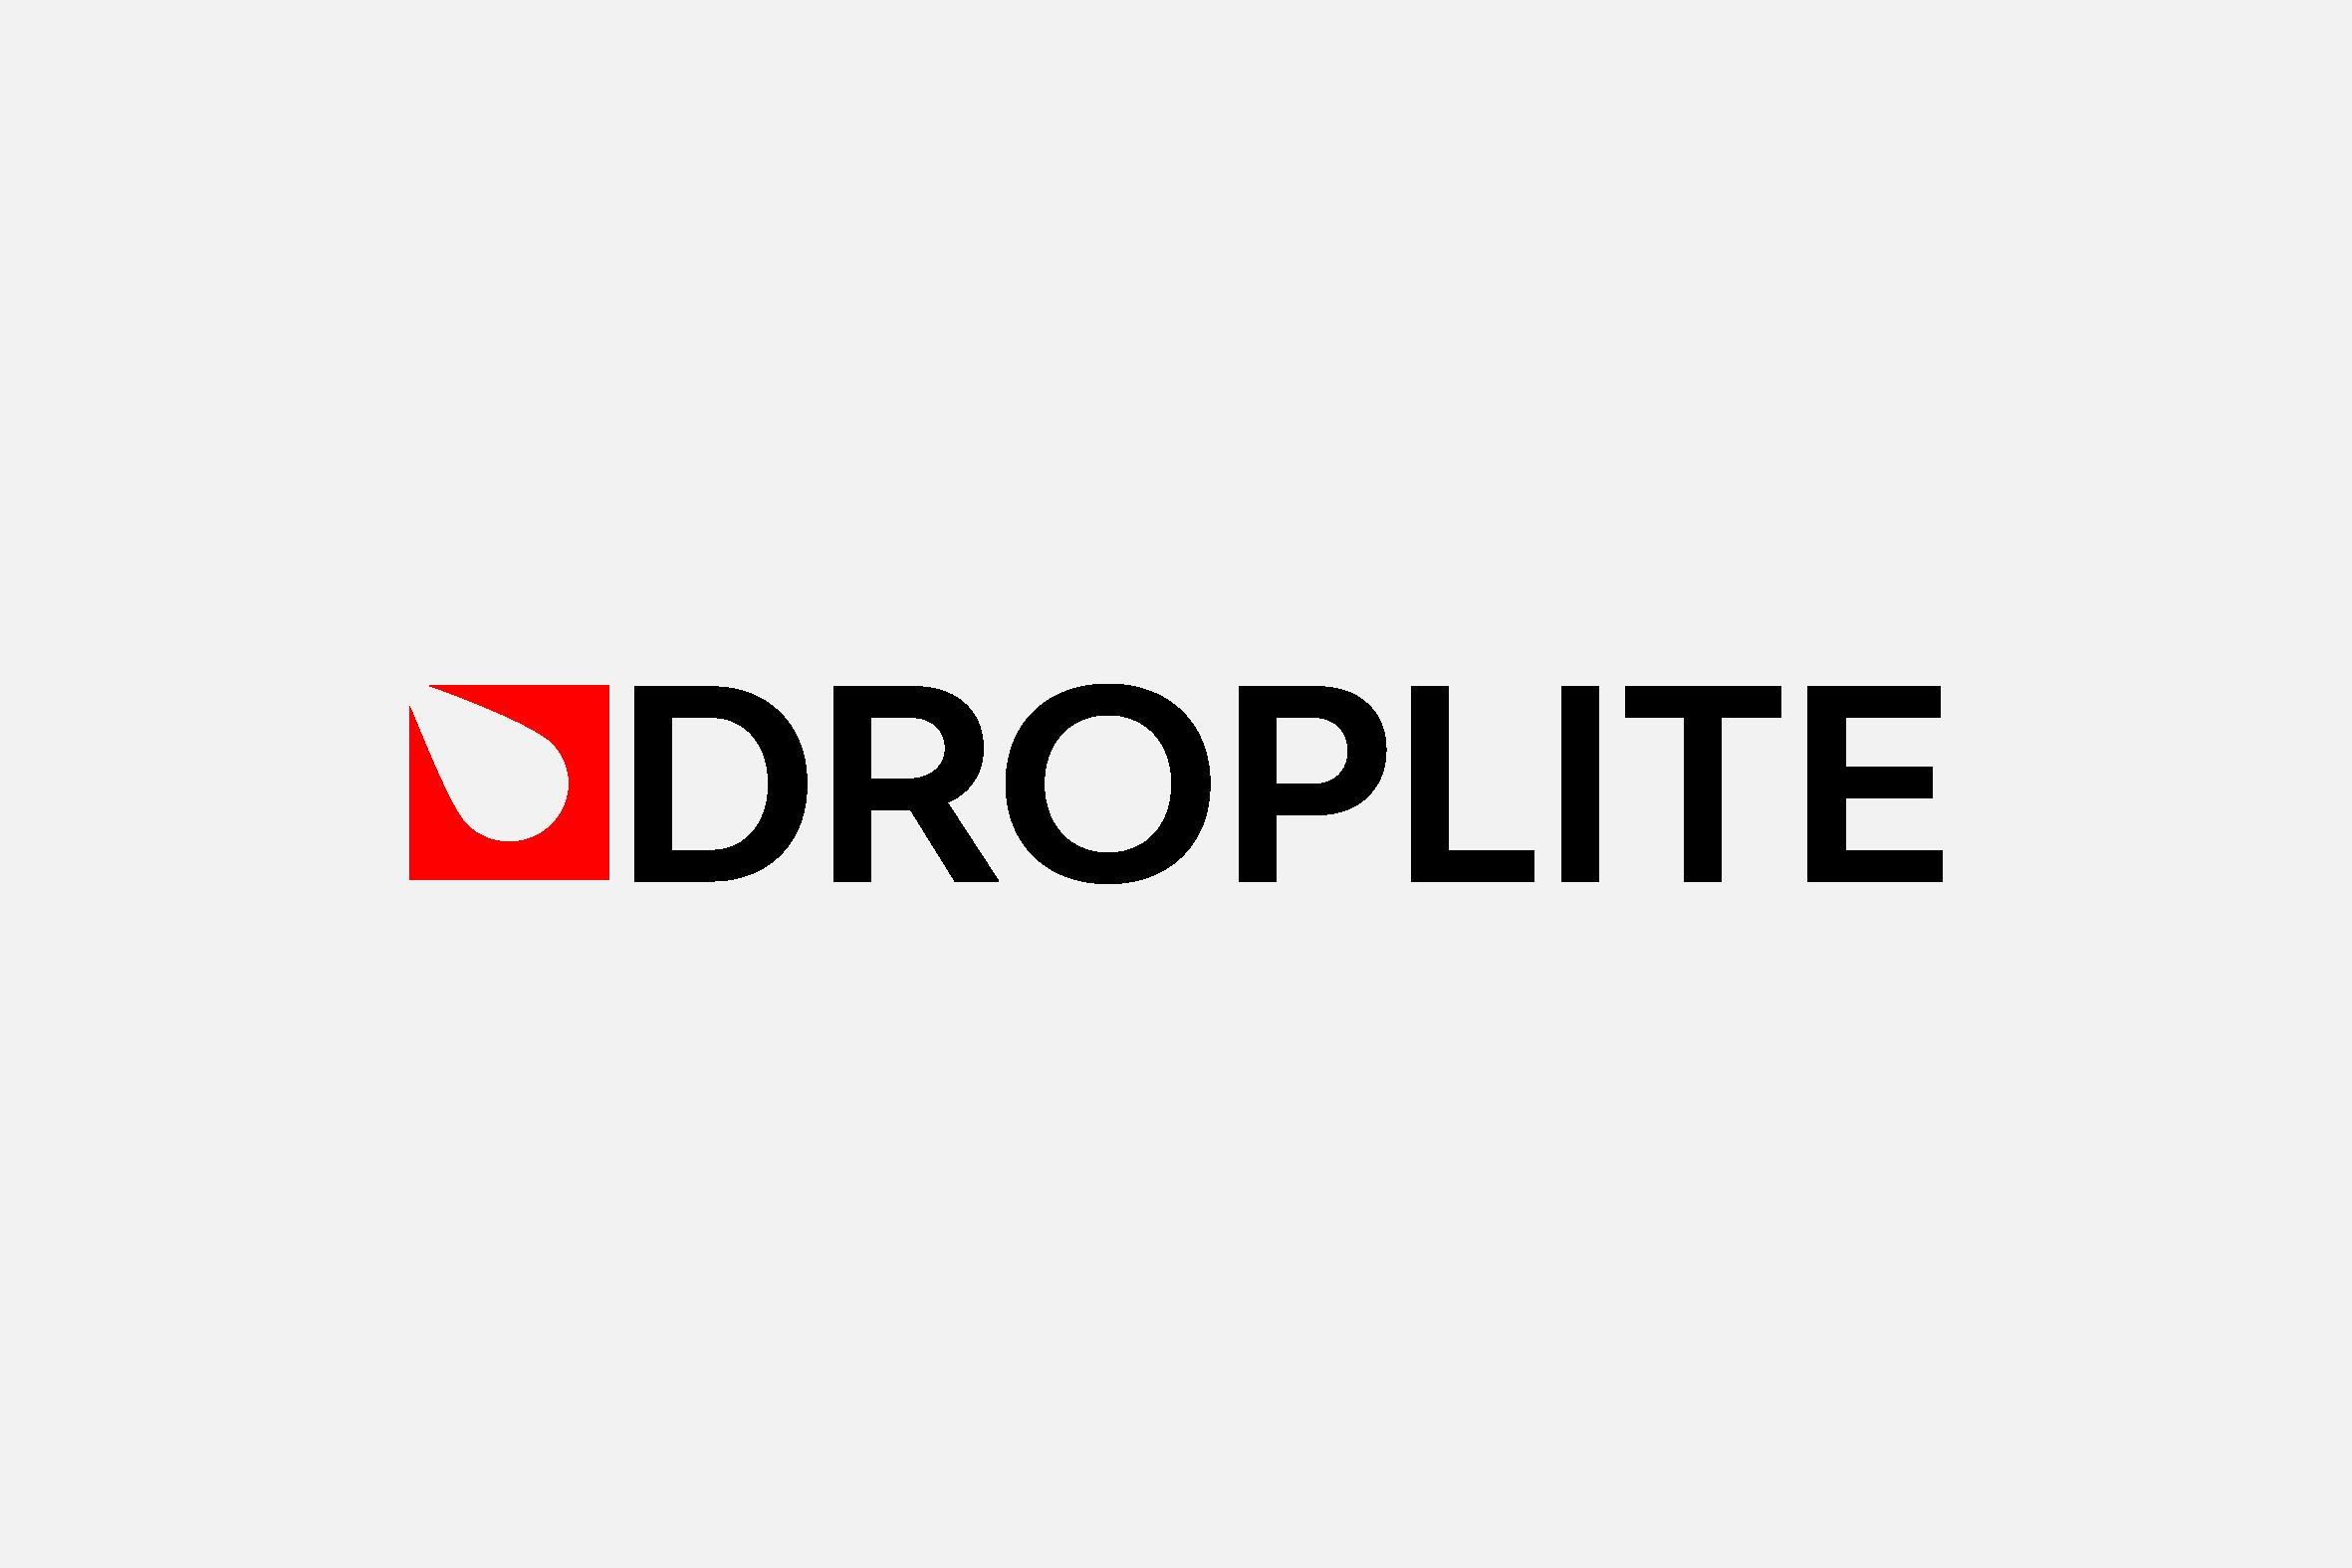 Droplite-logotype-Daniel-Cavalcanti